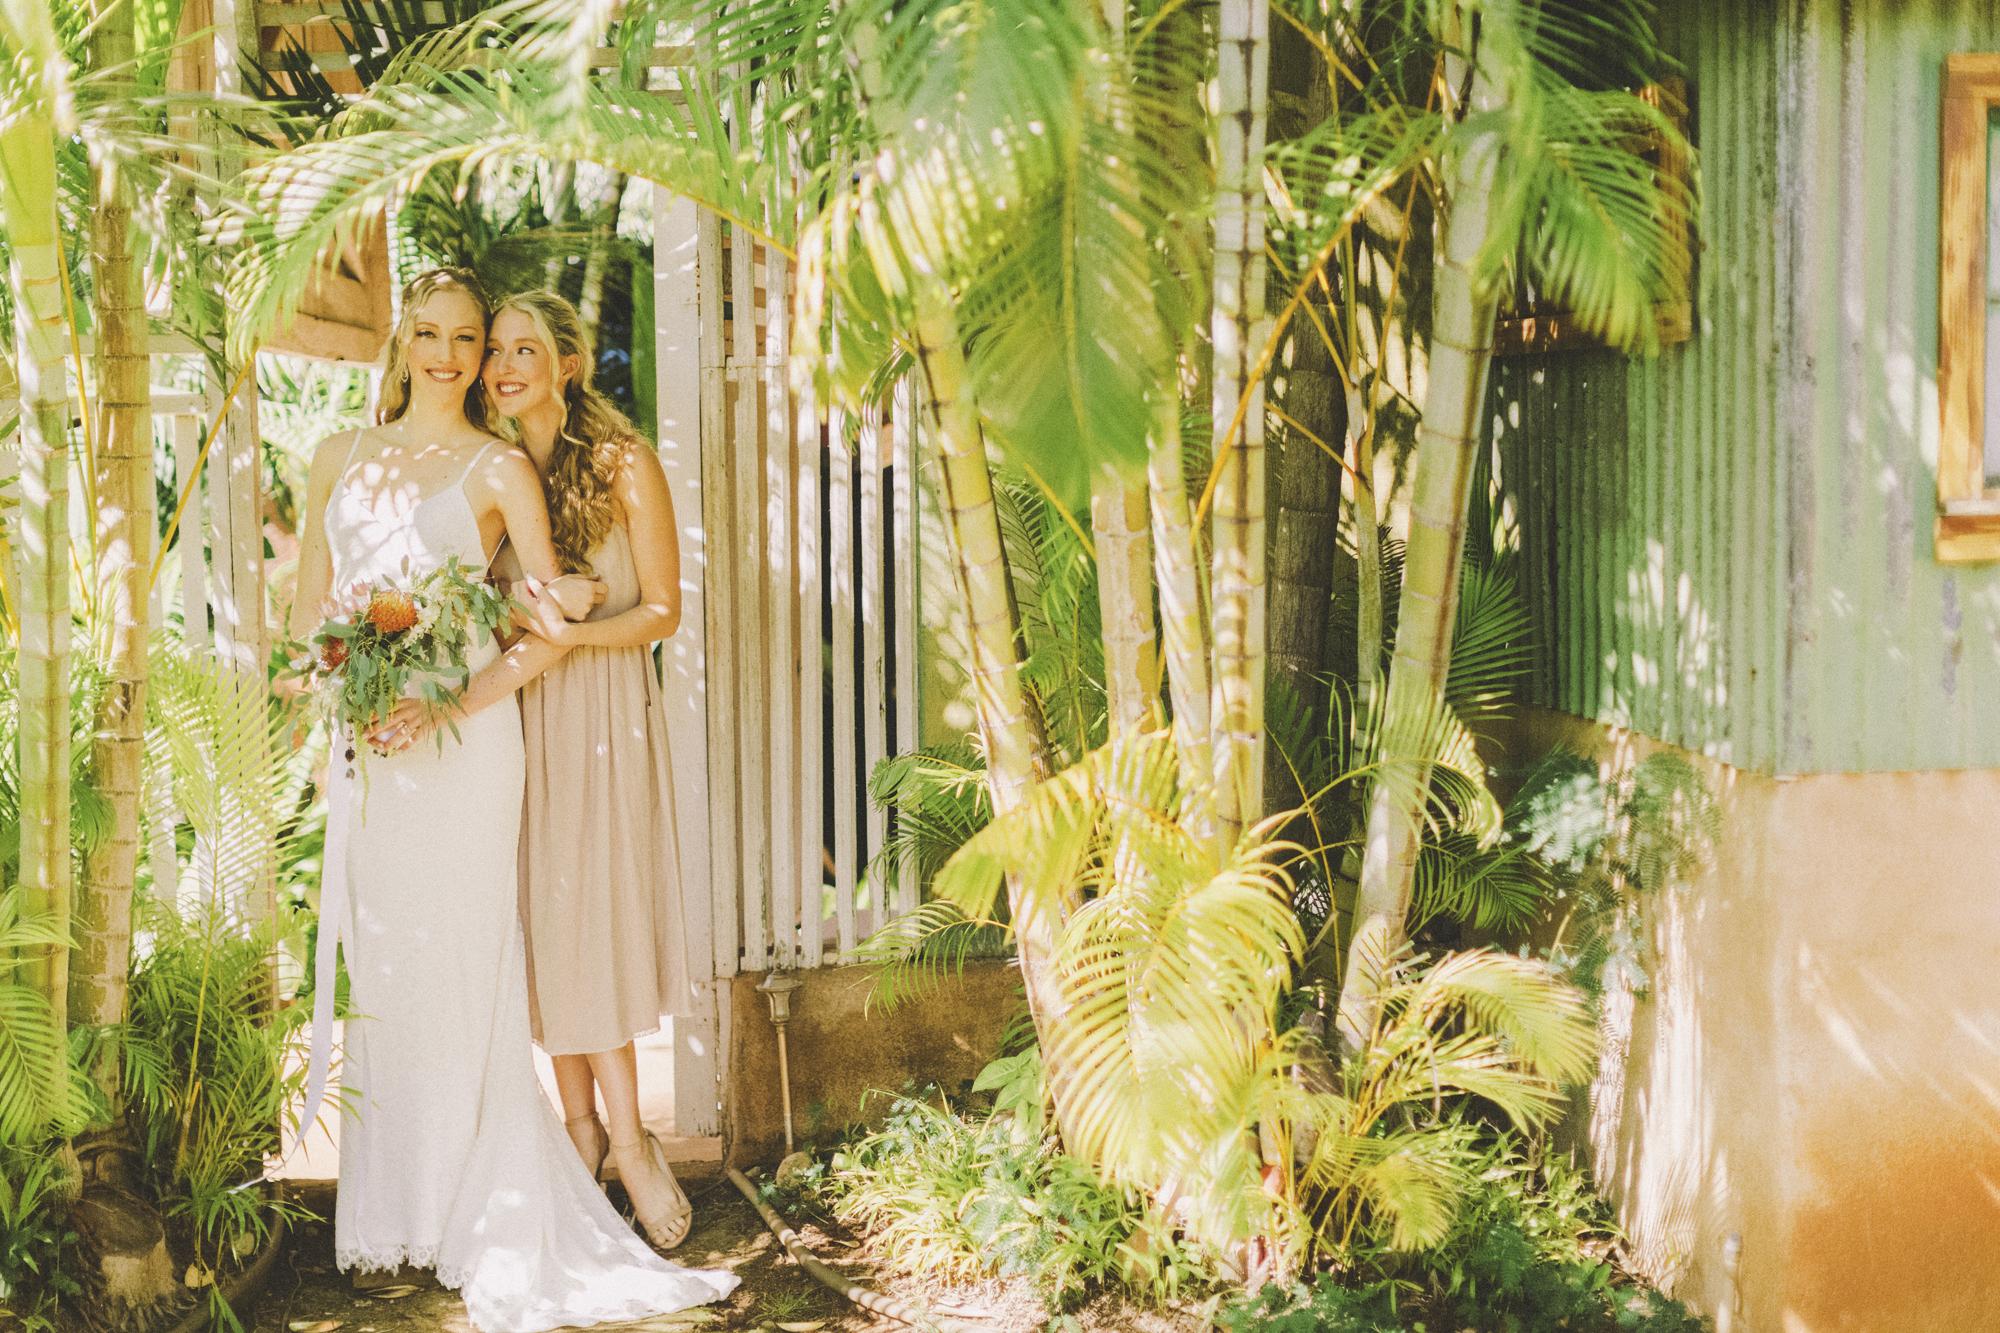 angie-diaz-photography-maui-wedding-39.jpg